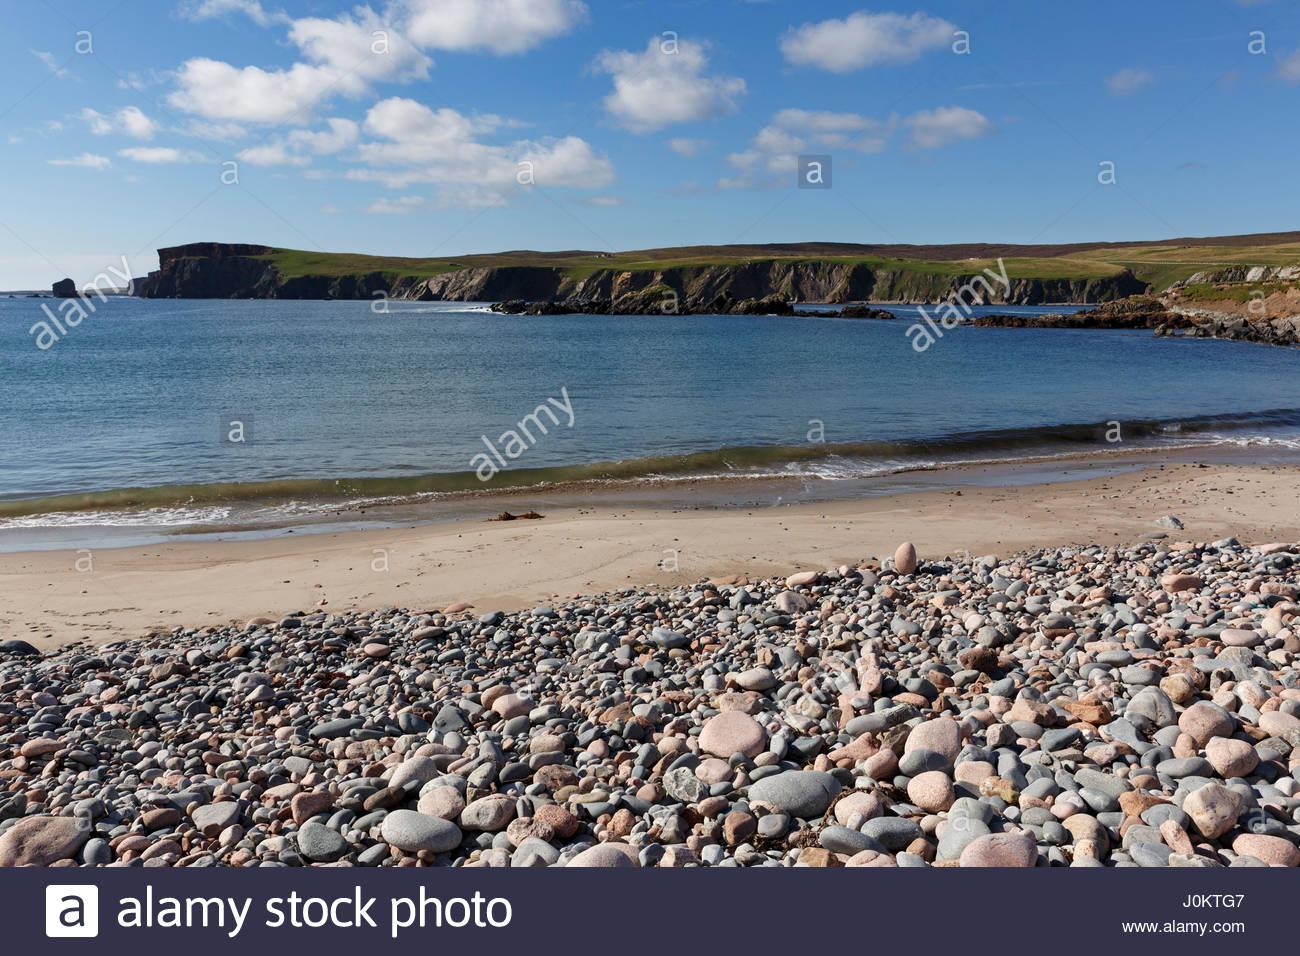 Stony Beach at Hillswick, Northmavine, Mainland, Shetland Islands, Scotland - Stock Image